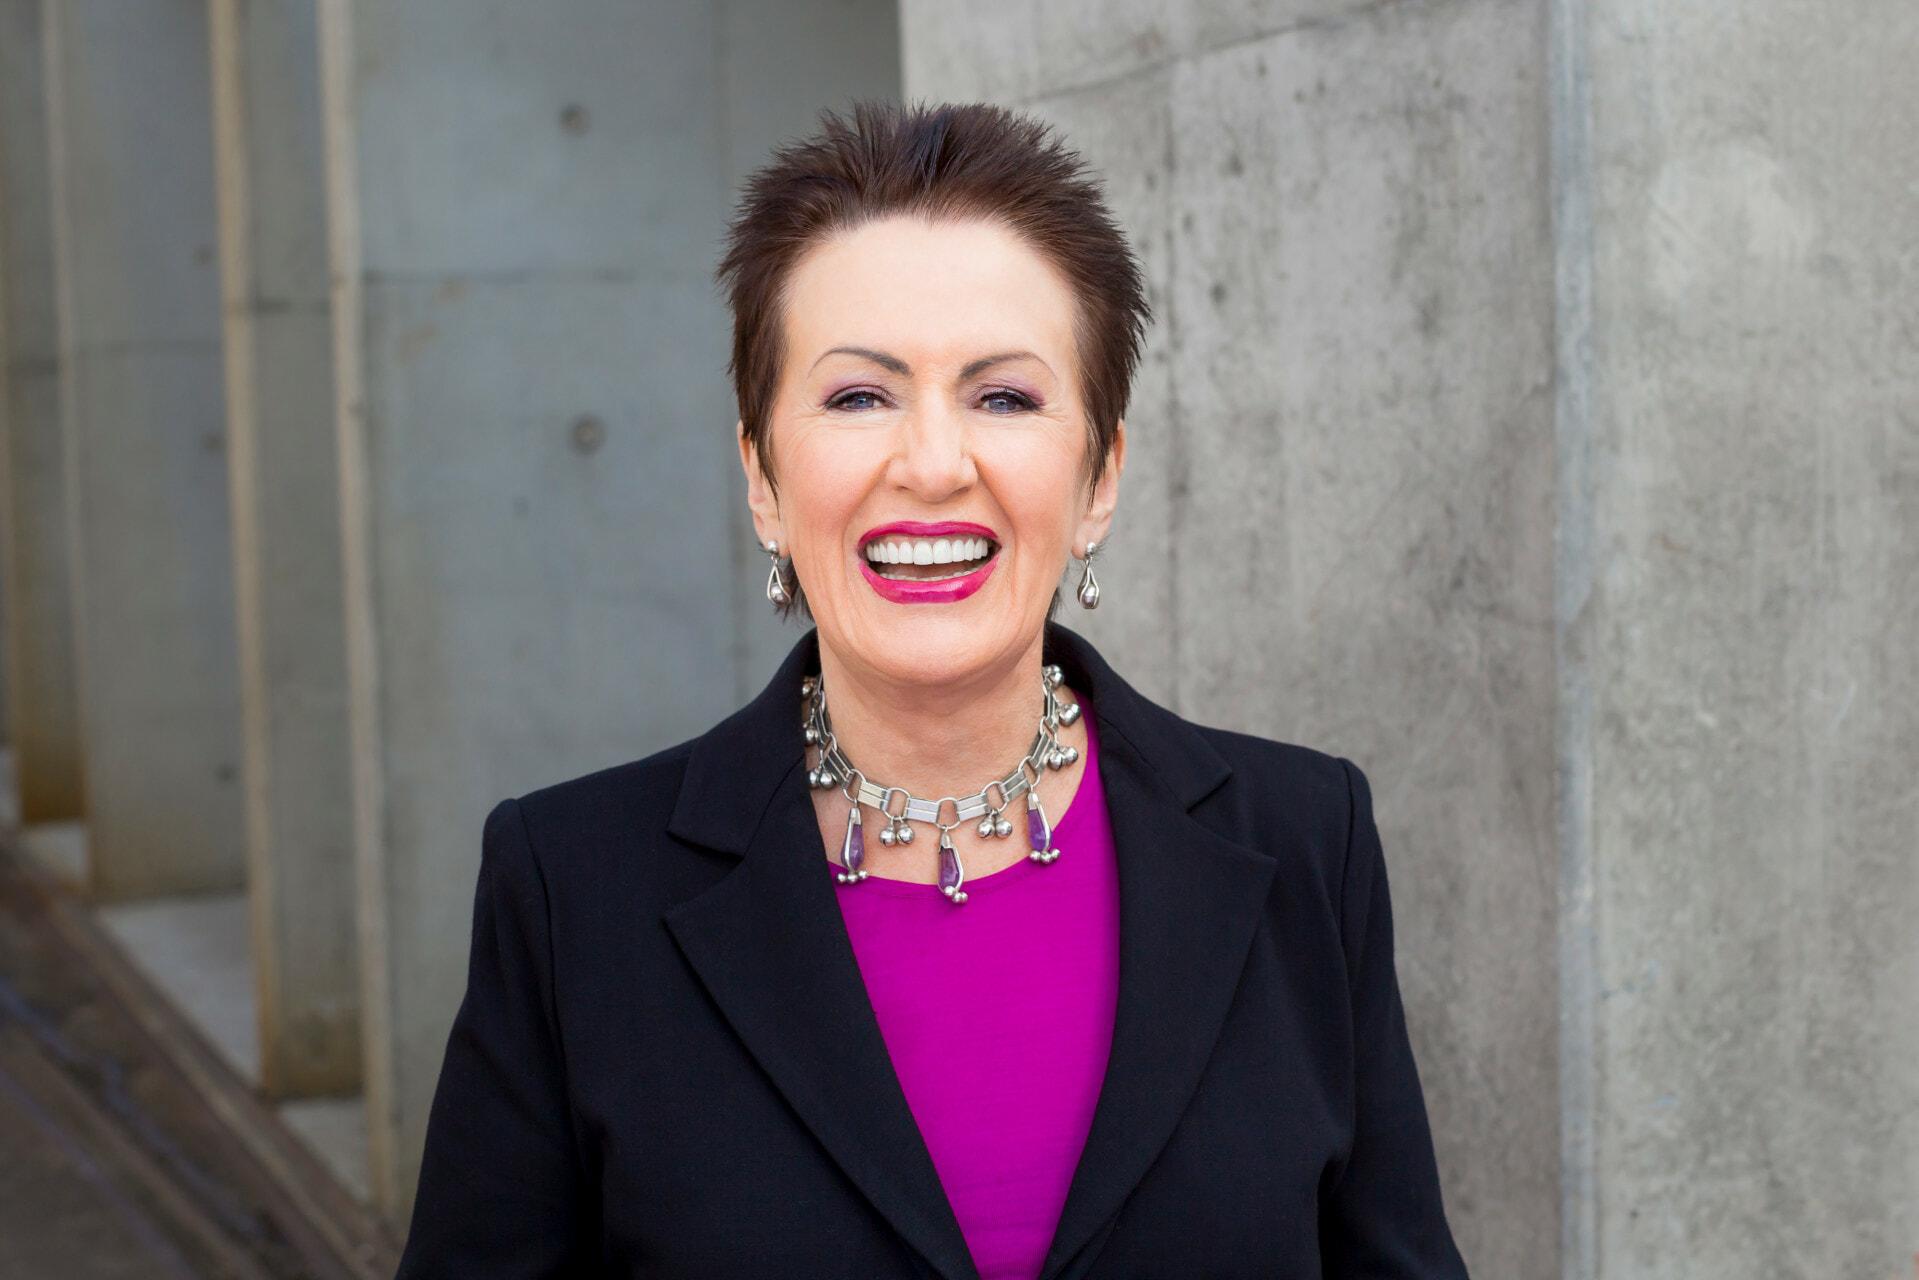 Clover Margaret Moore